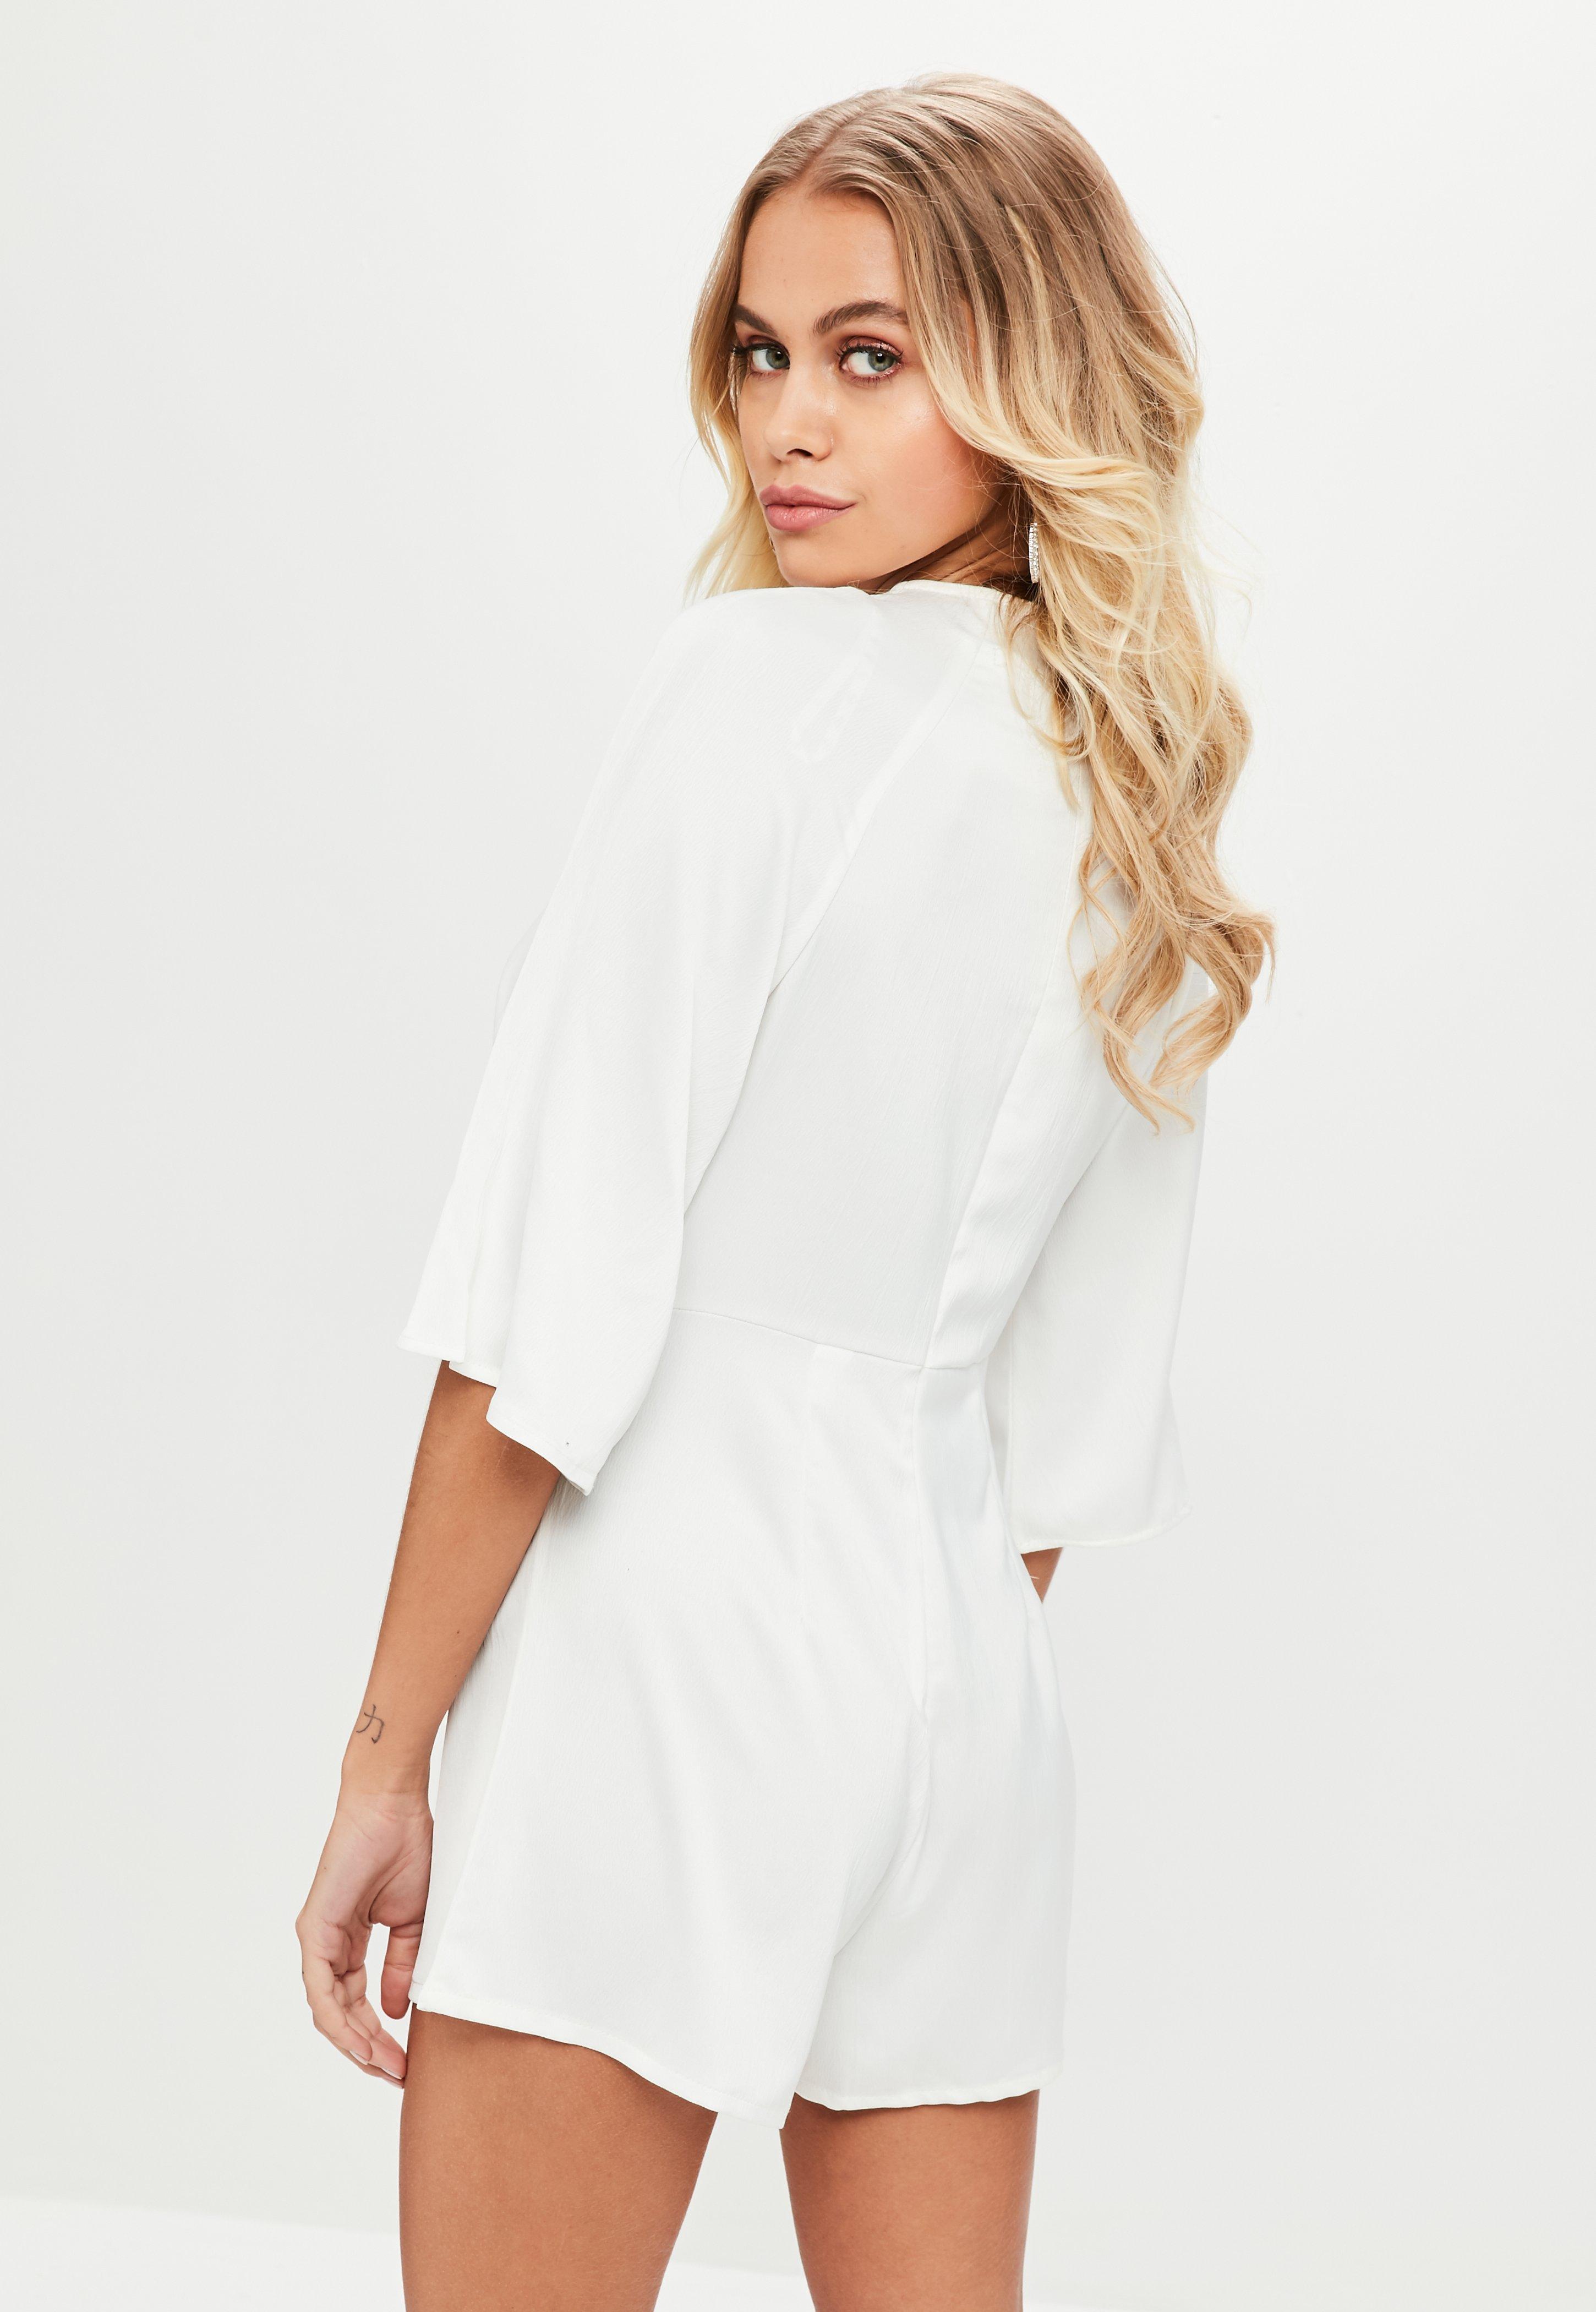 8e67374b0454 Lyst - Missguided White Tie Front Kimono Sleeve Romper in White